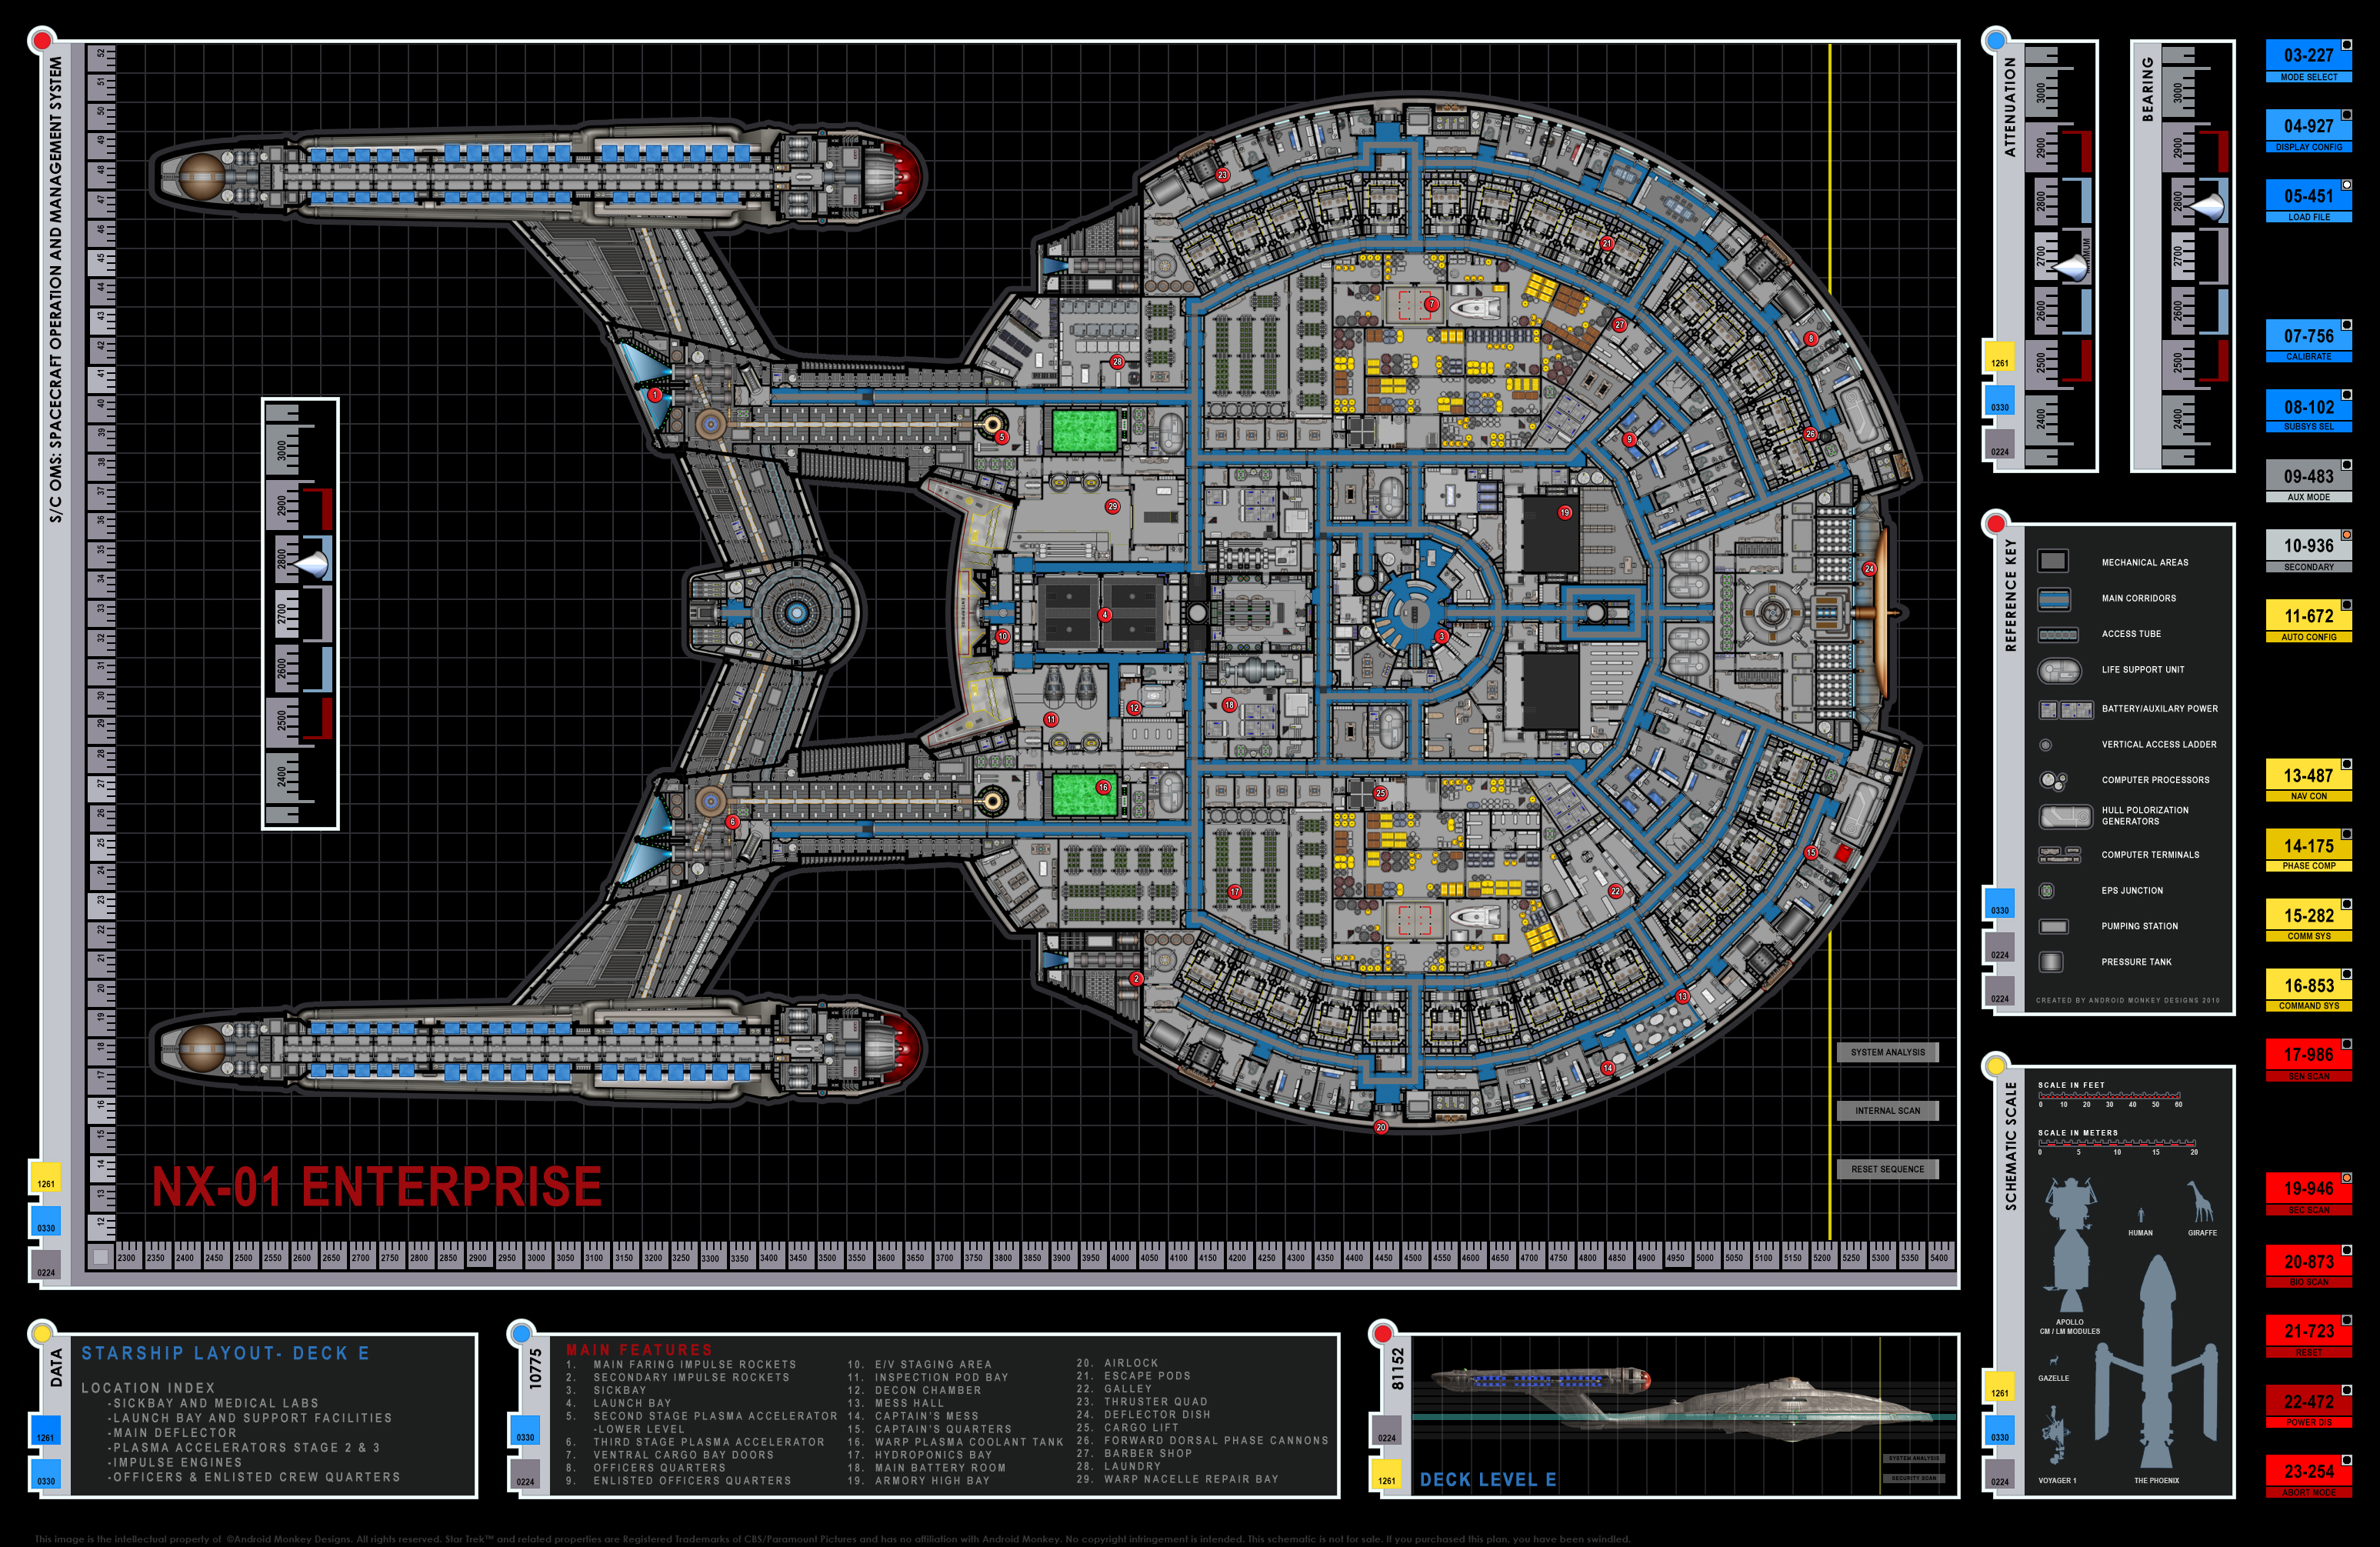 Star Trek Blueprints Enterprise Nx 01 Deck Plans